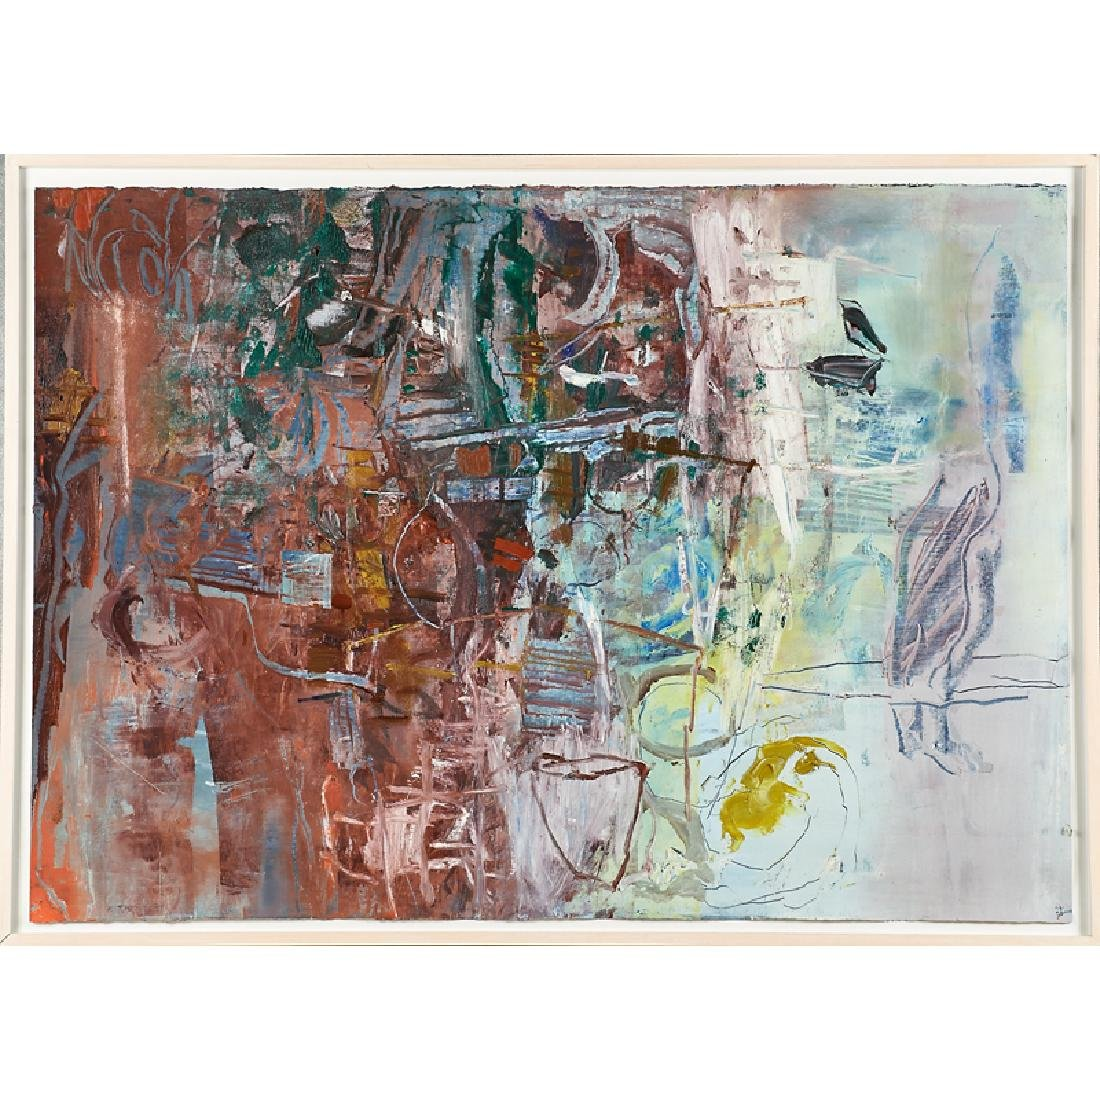 KEITH RAGONE (American, b. 1954)